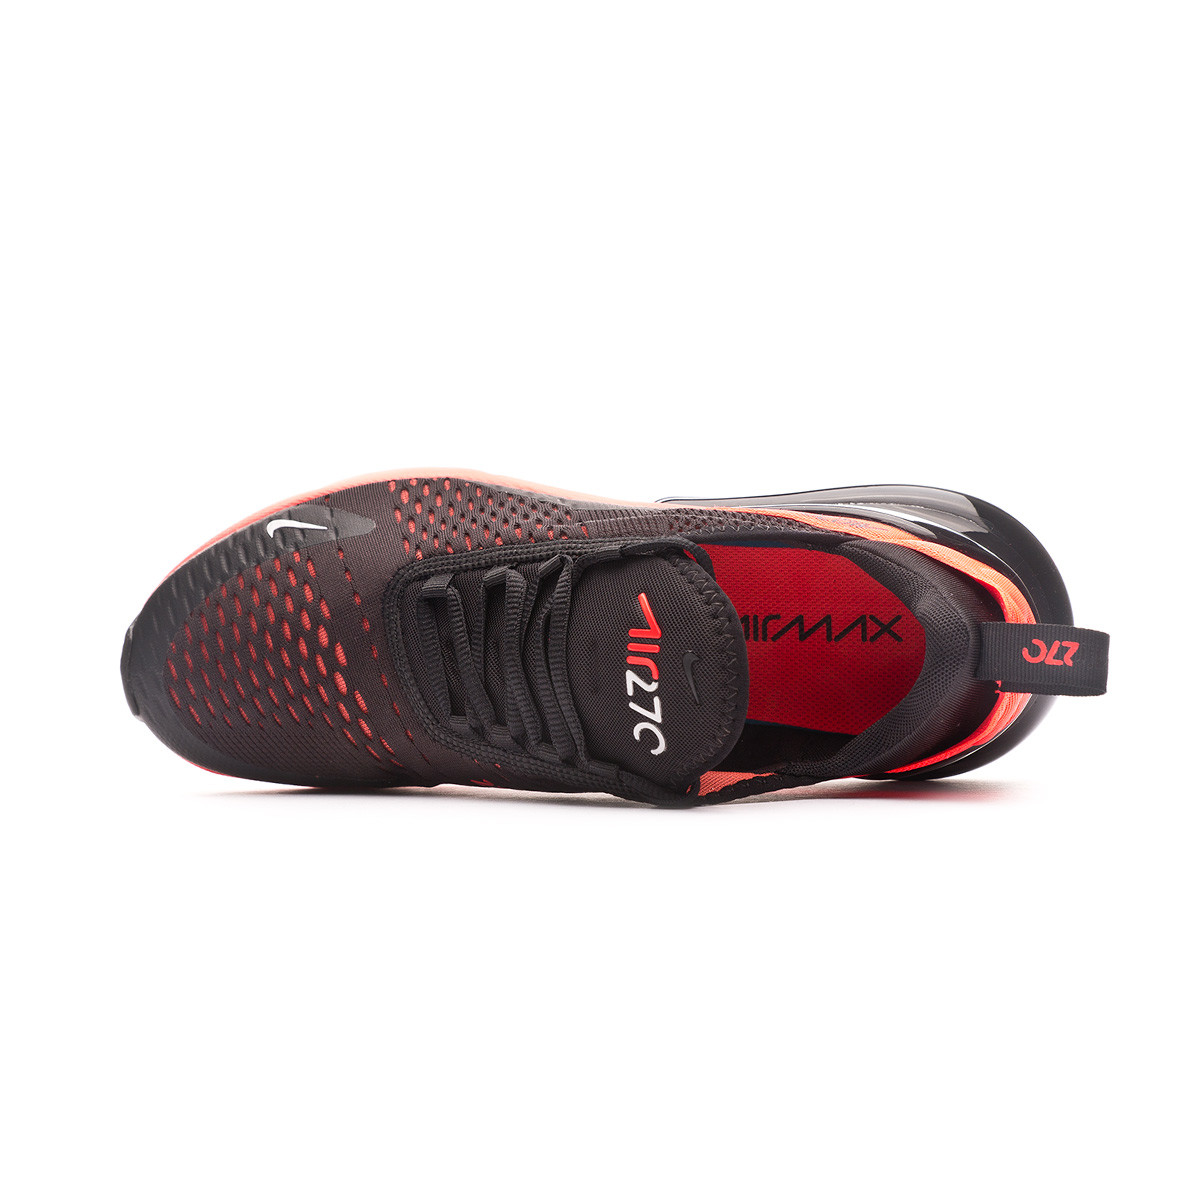 Originais Nike Air Max 270 Atlético Running Shoes Sapatilhas